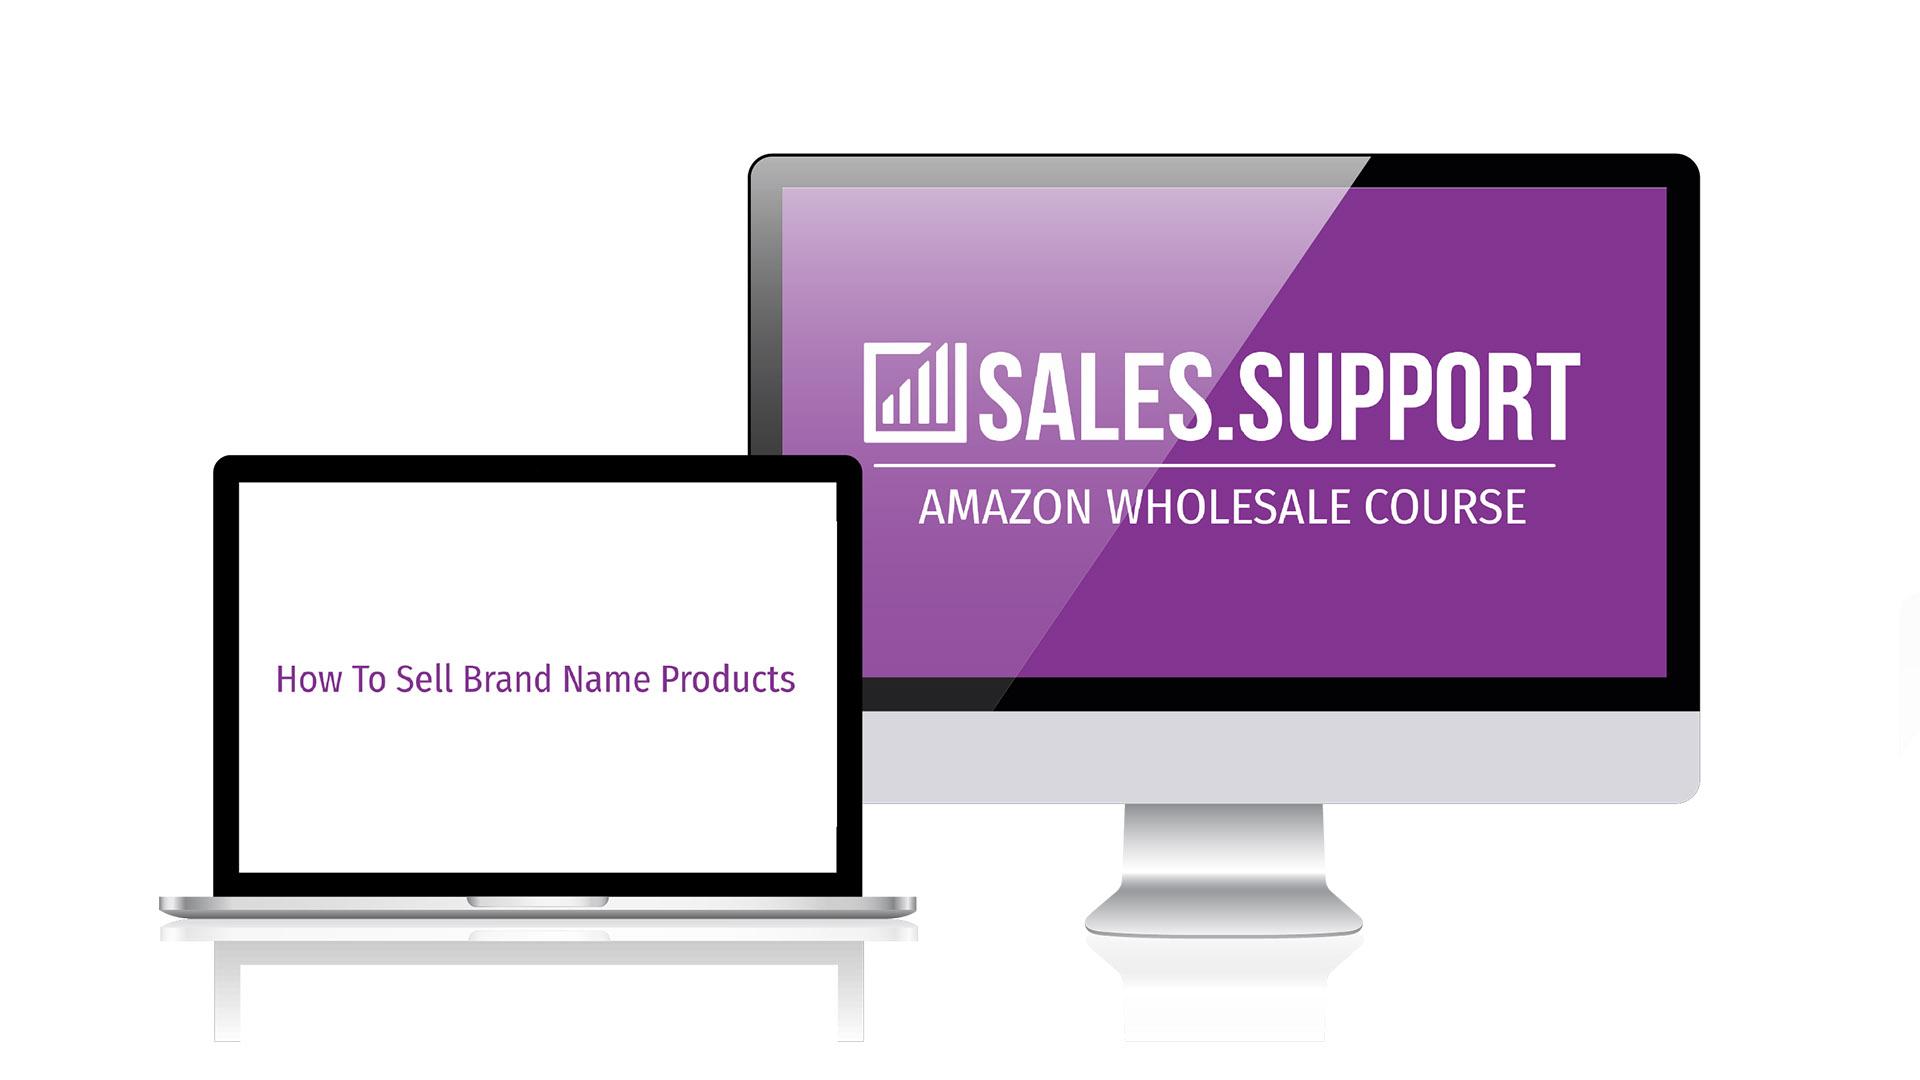 Exclusive Amazon Wholesale Course 2020